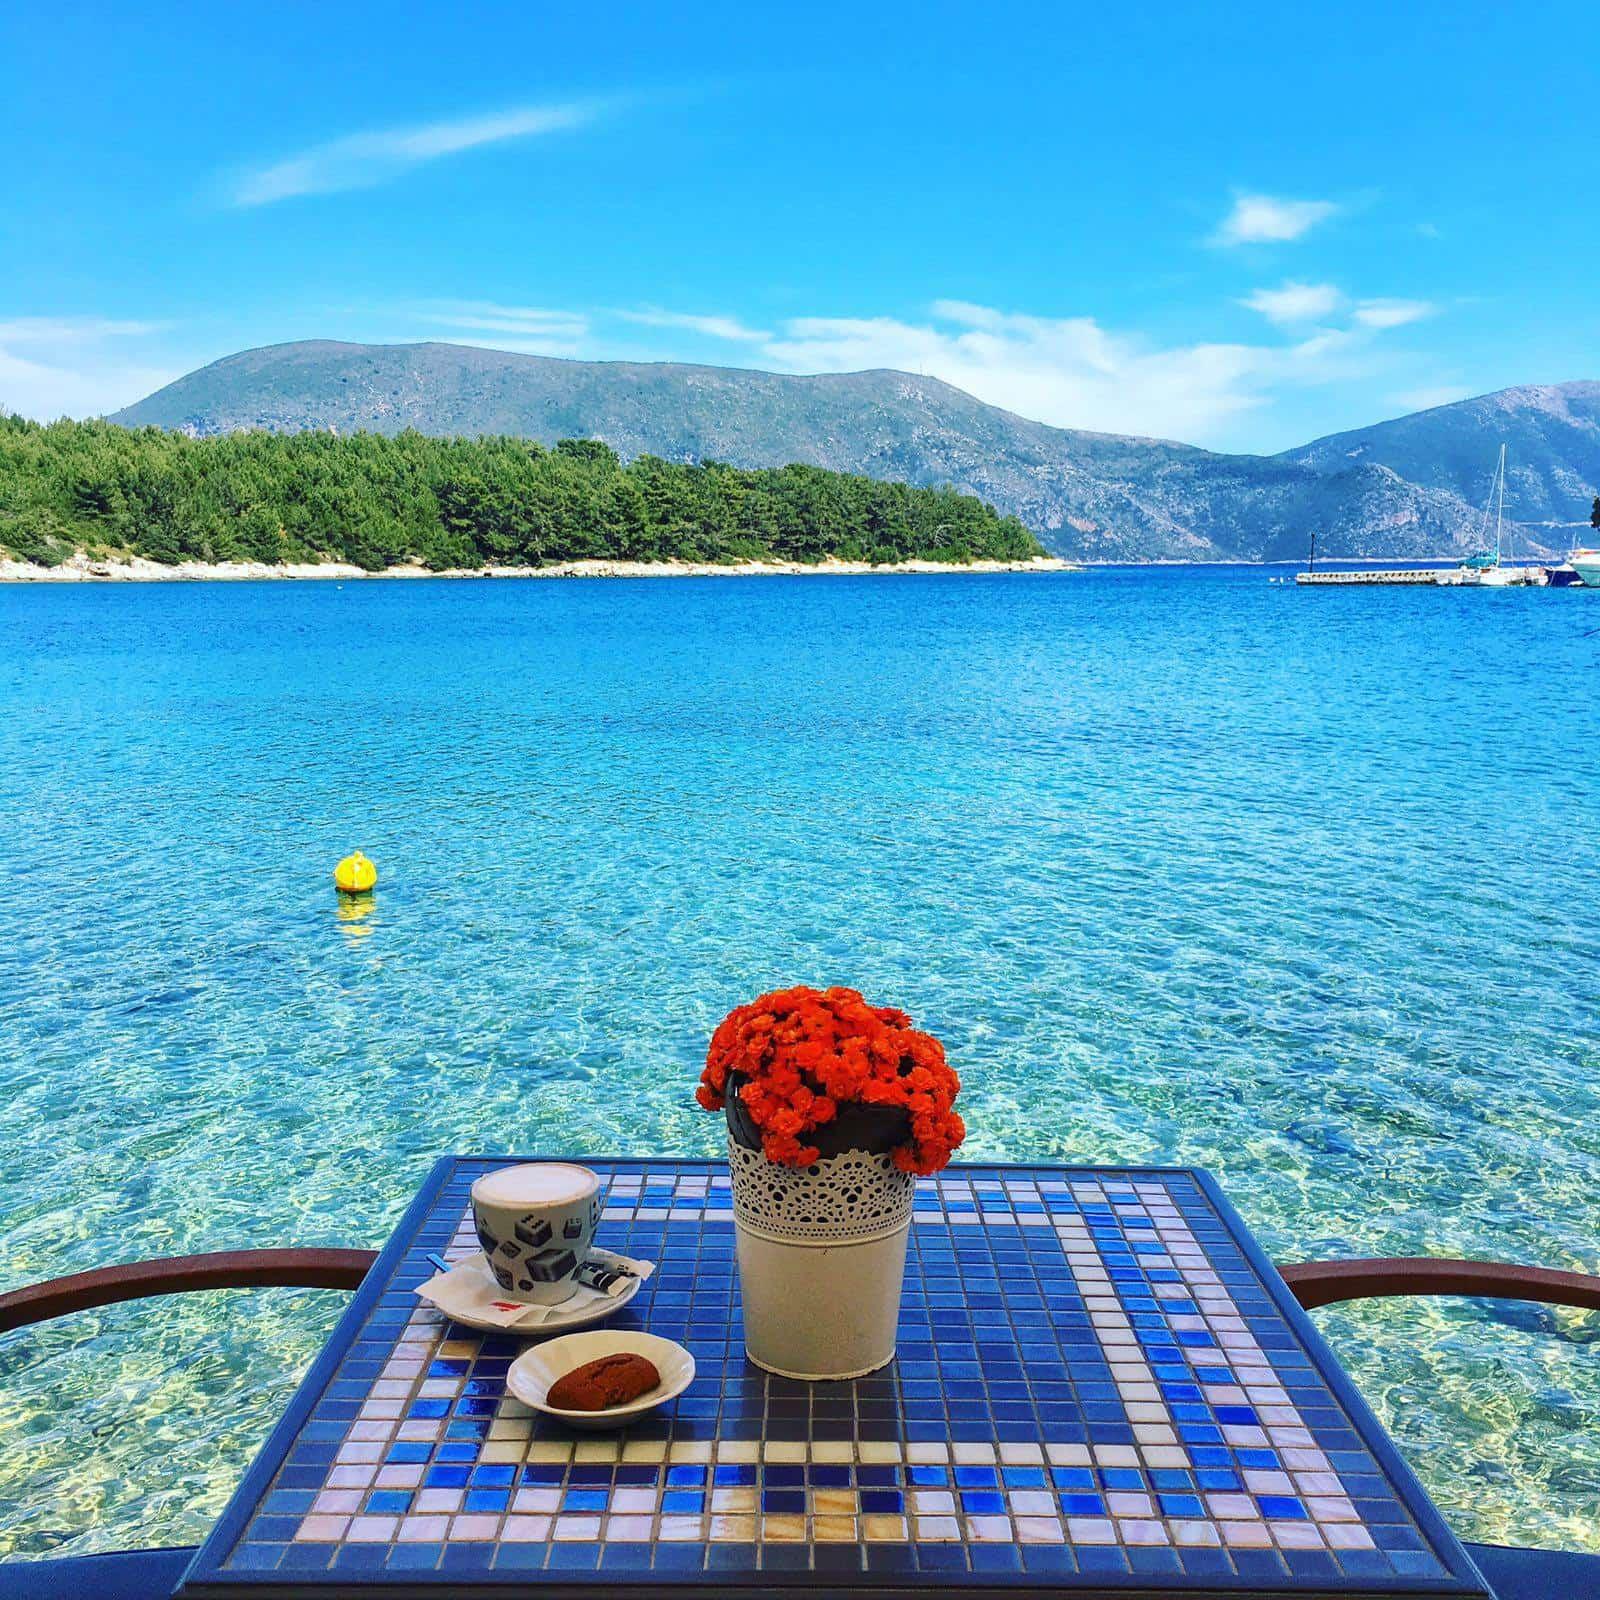 cafe en paisaje griego